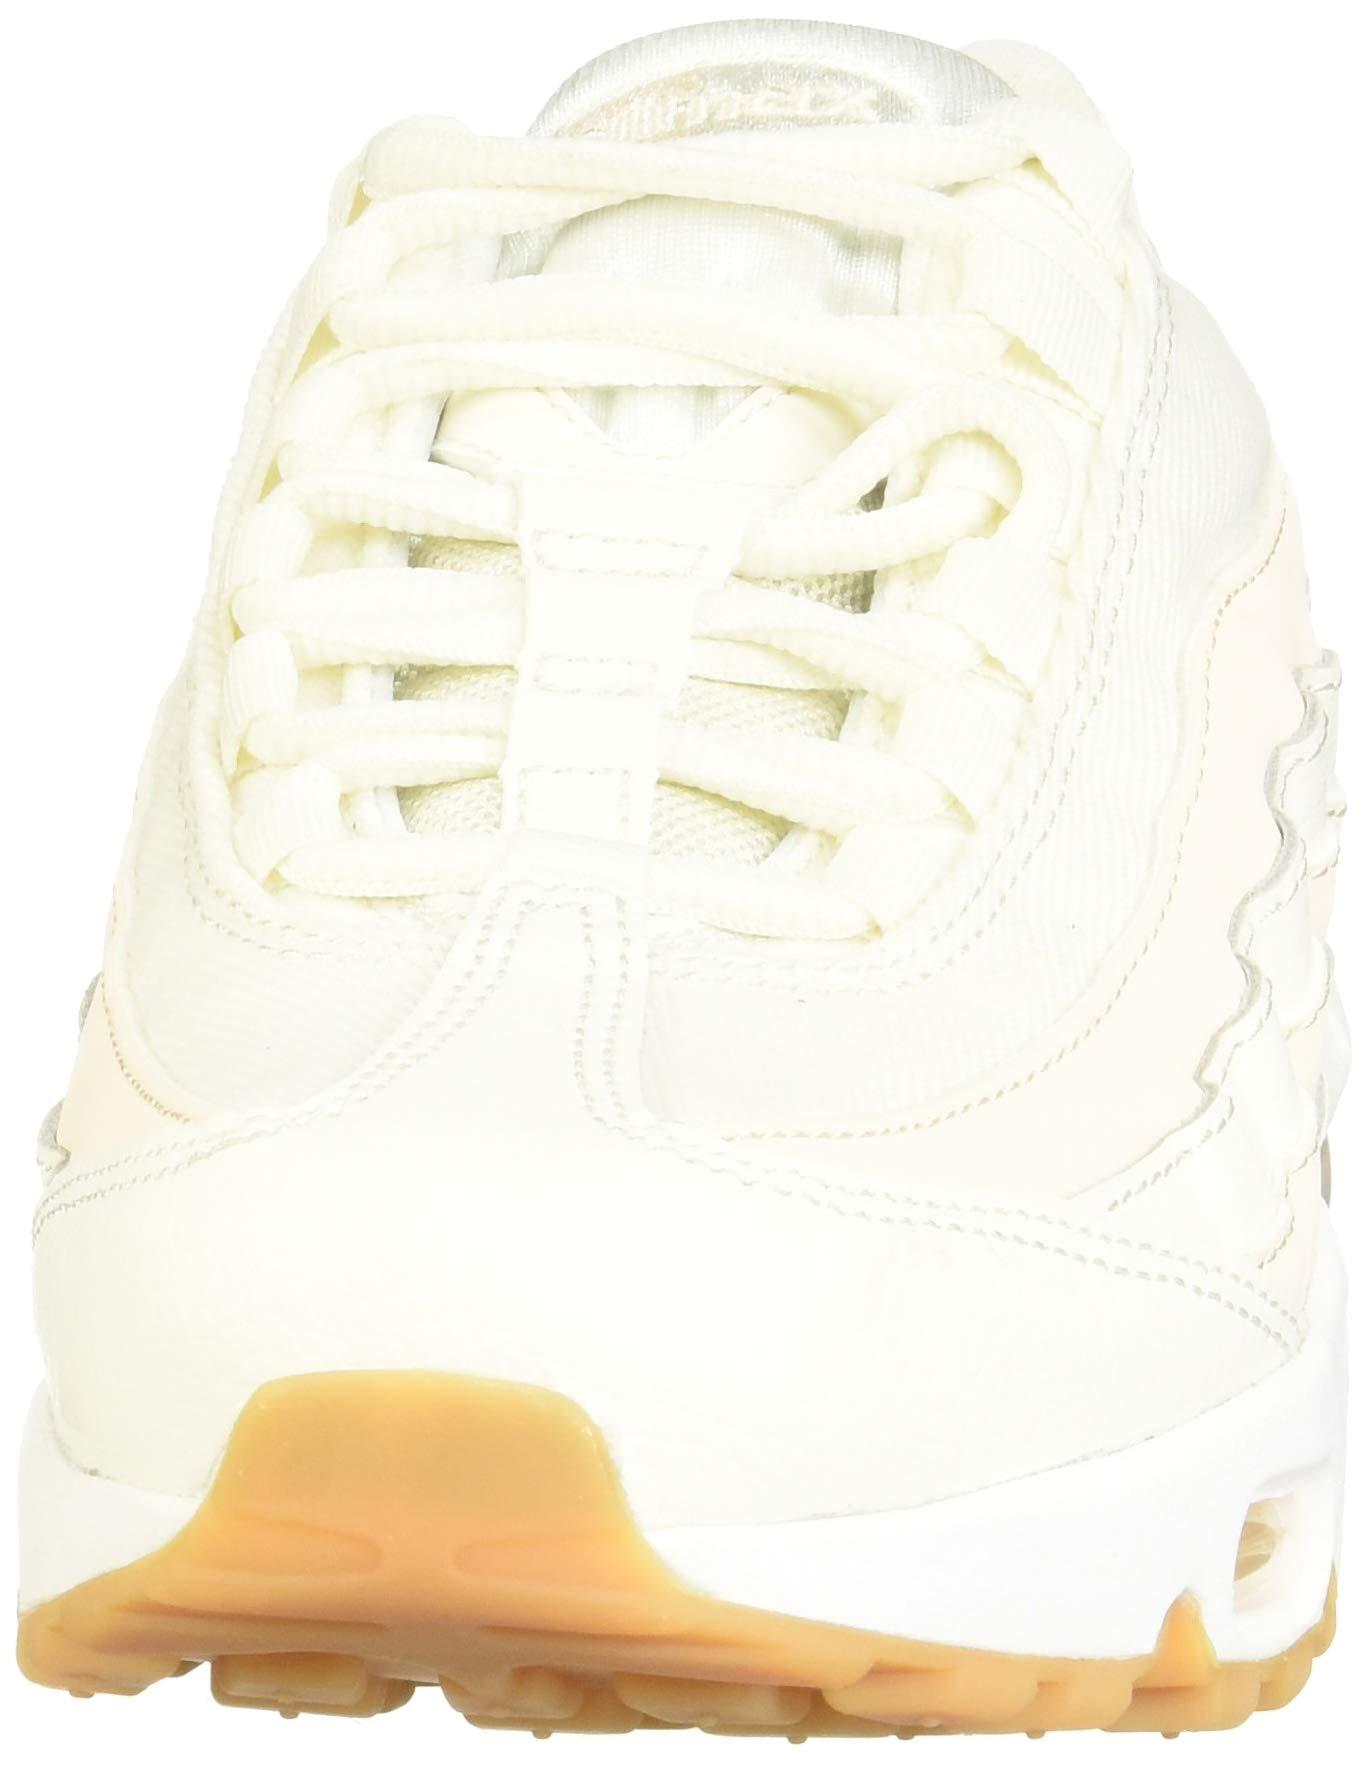 NIKE Women's Air Max 95 Gymnastics Shoes